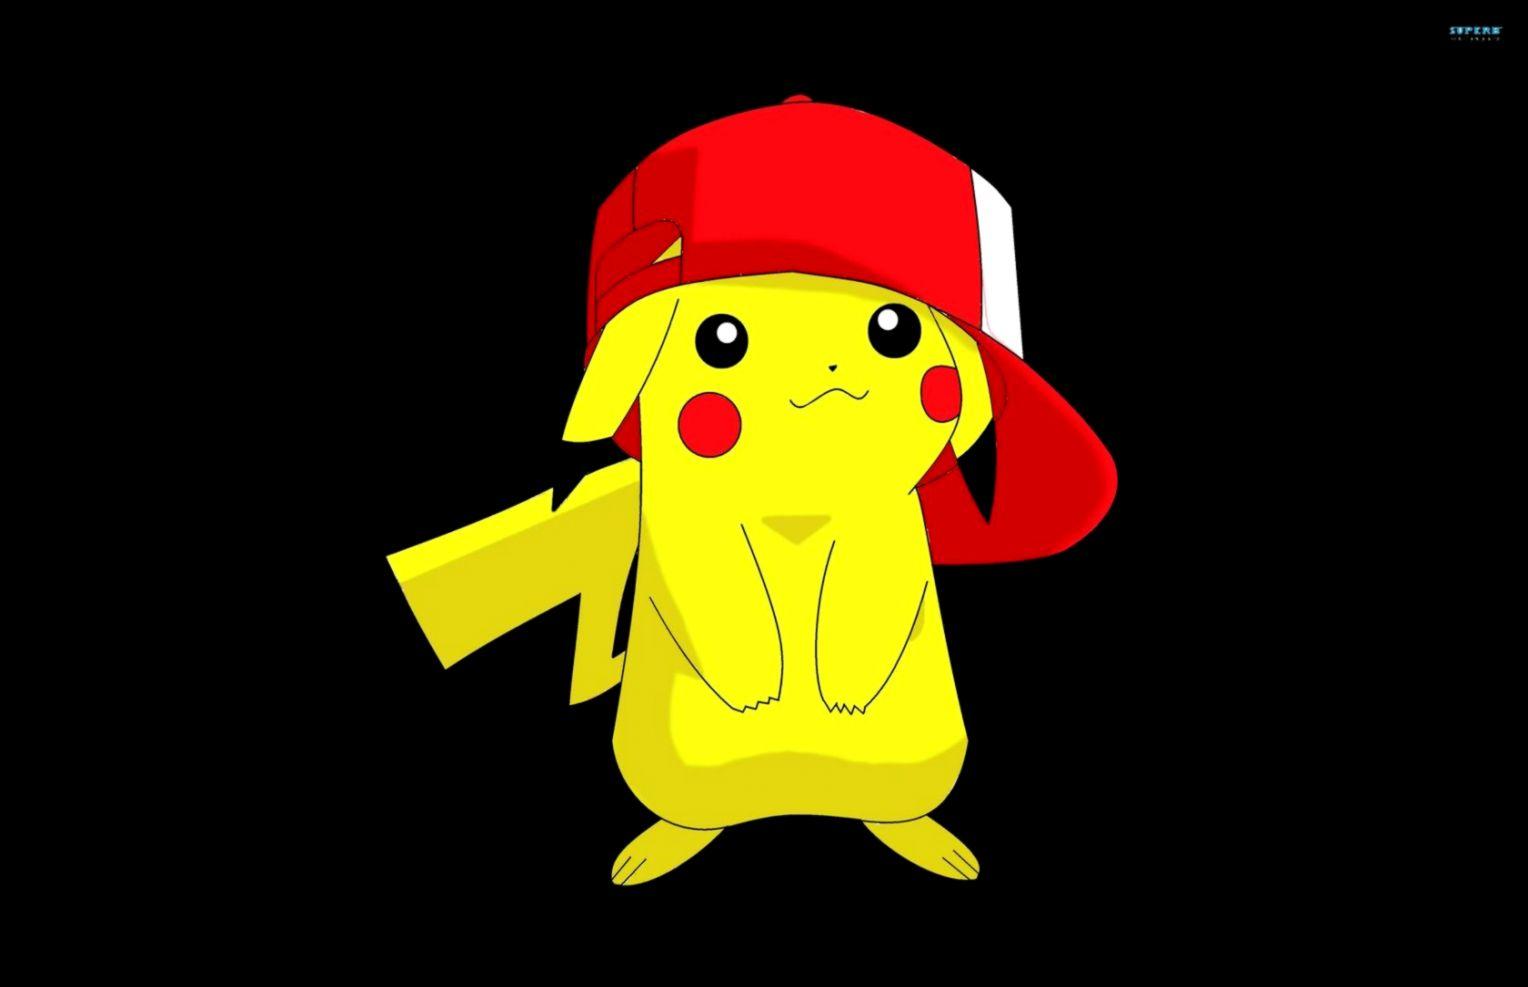 Pikachu Wallpaper | Best Wallpapers HD Collection